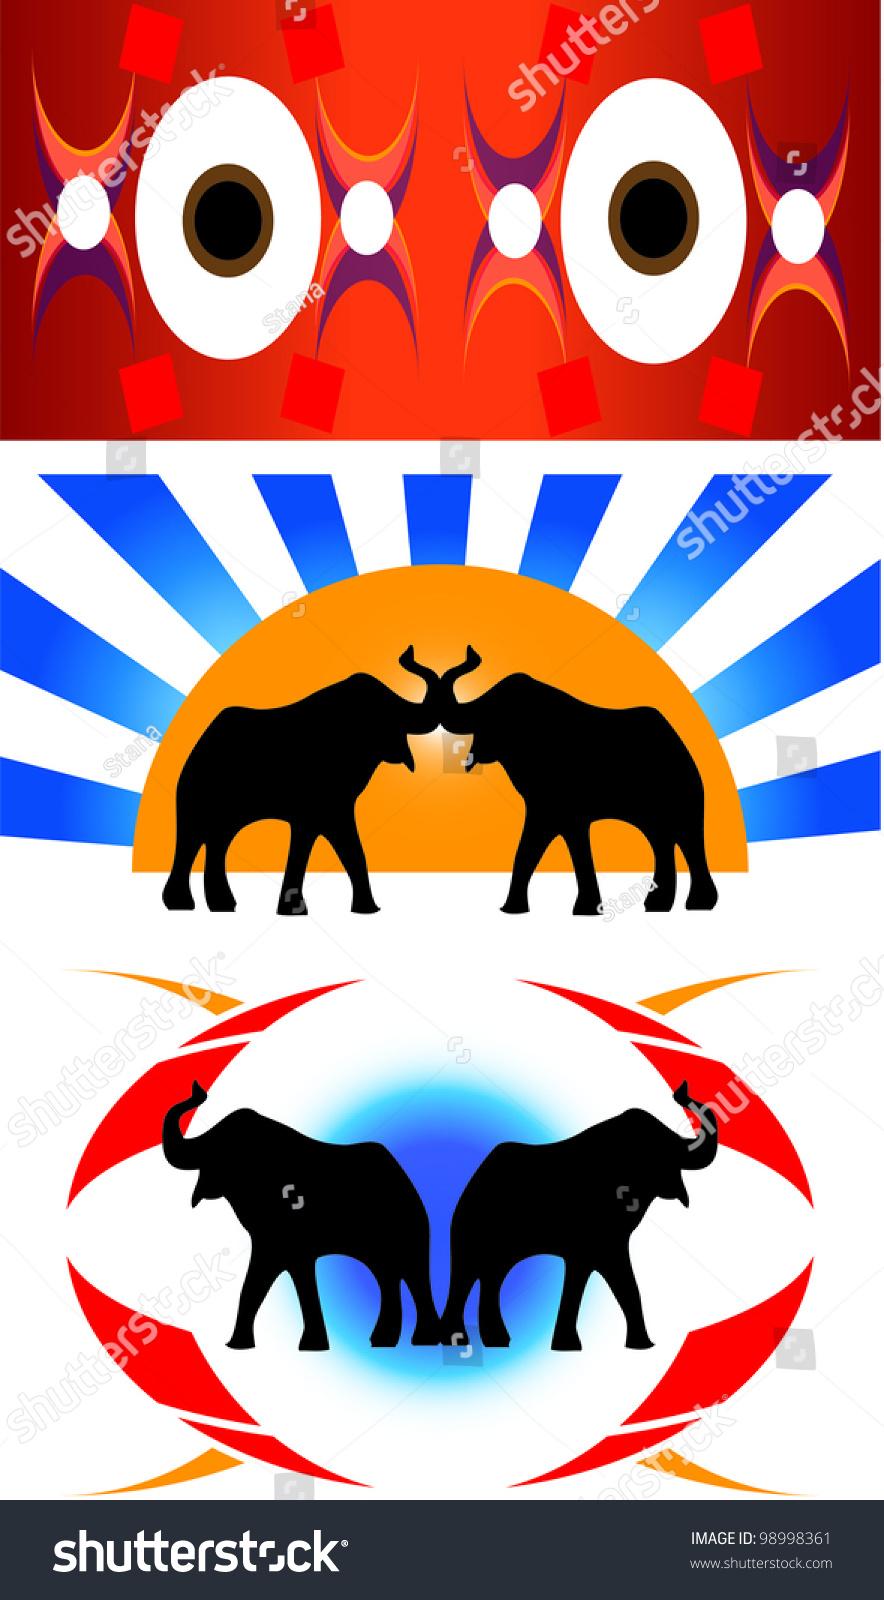 Elephant Print Stock Vector Illustration 98998361 ...